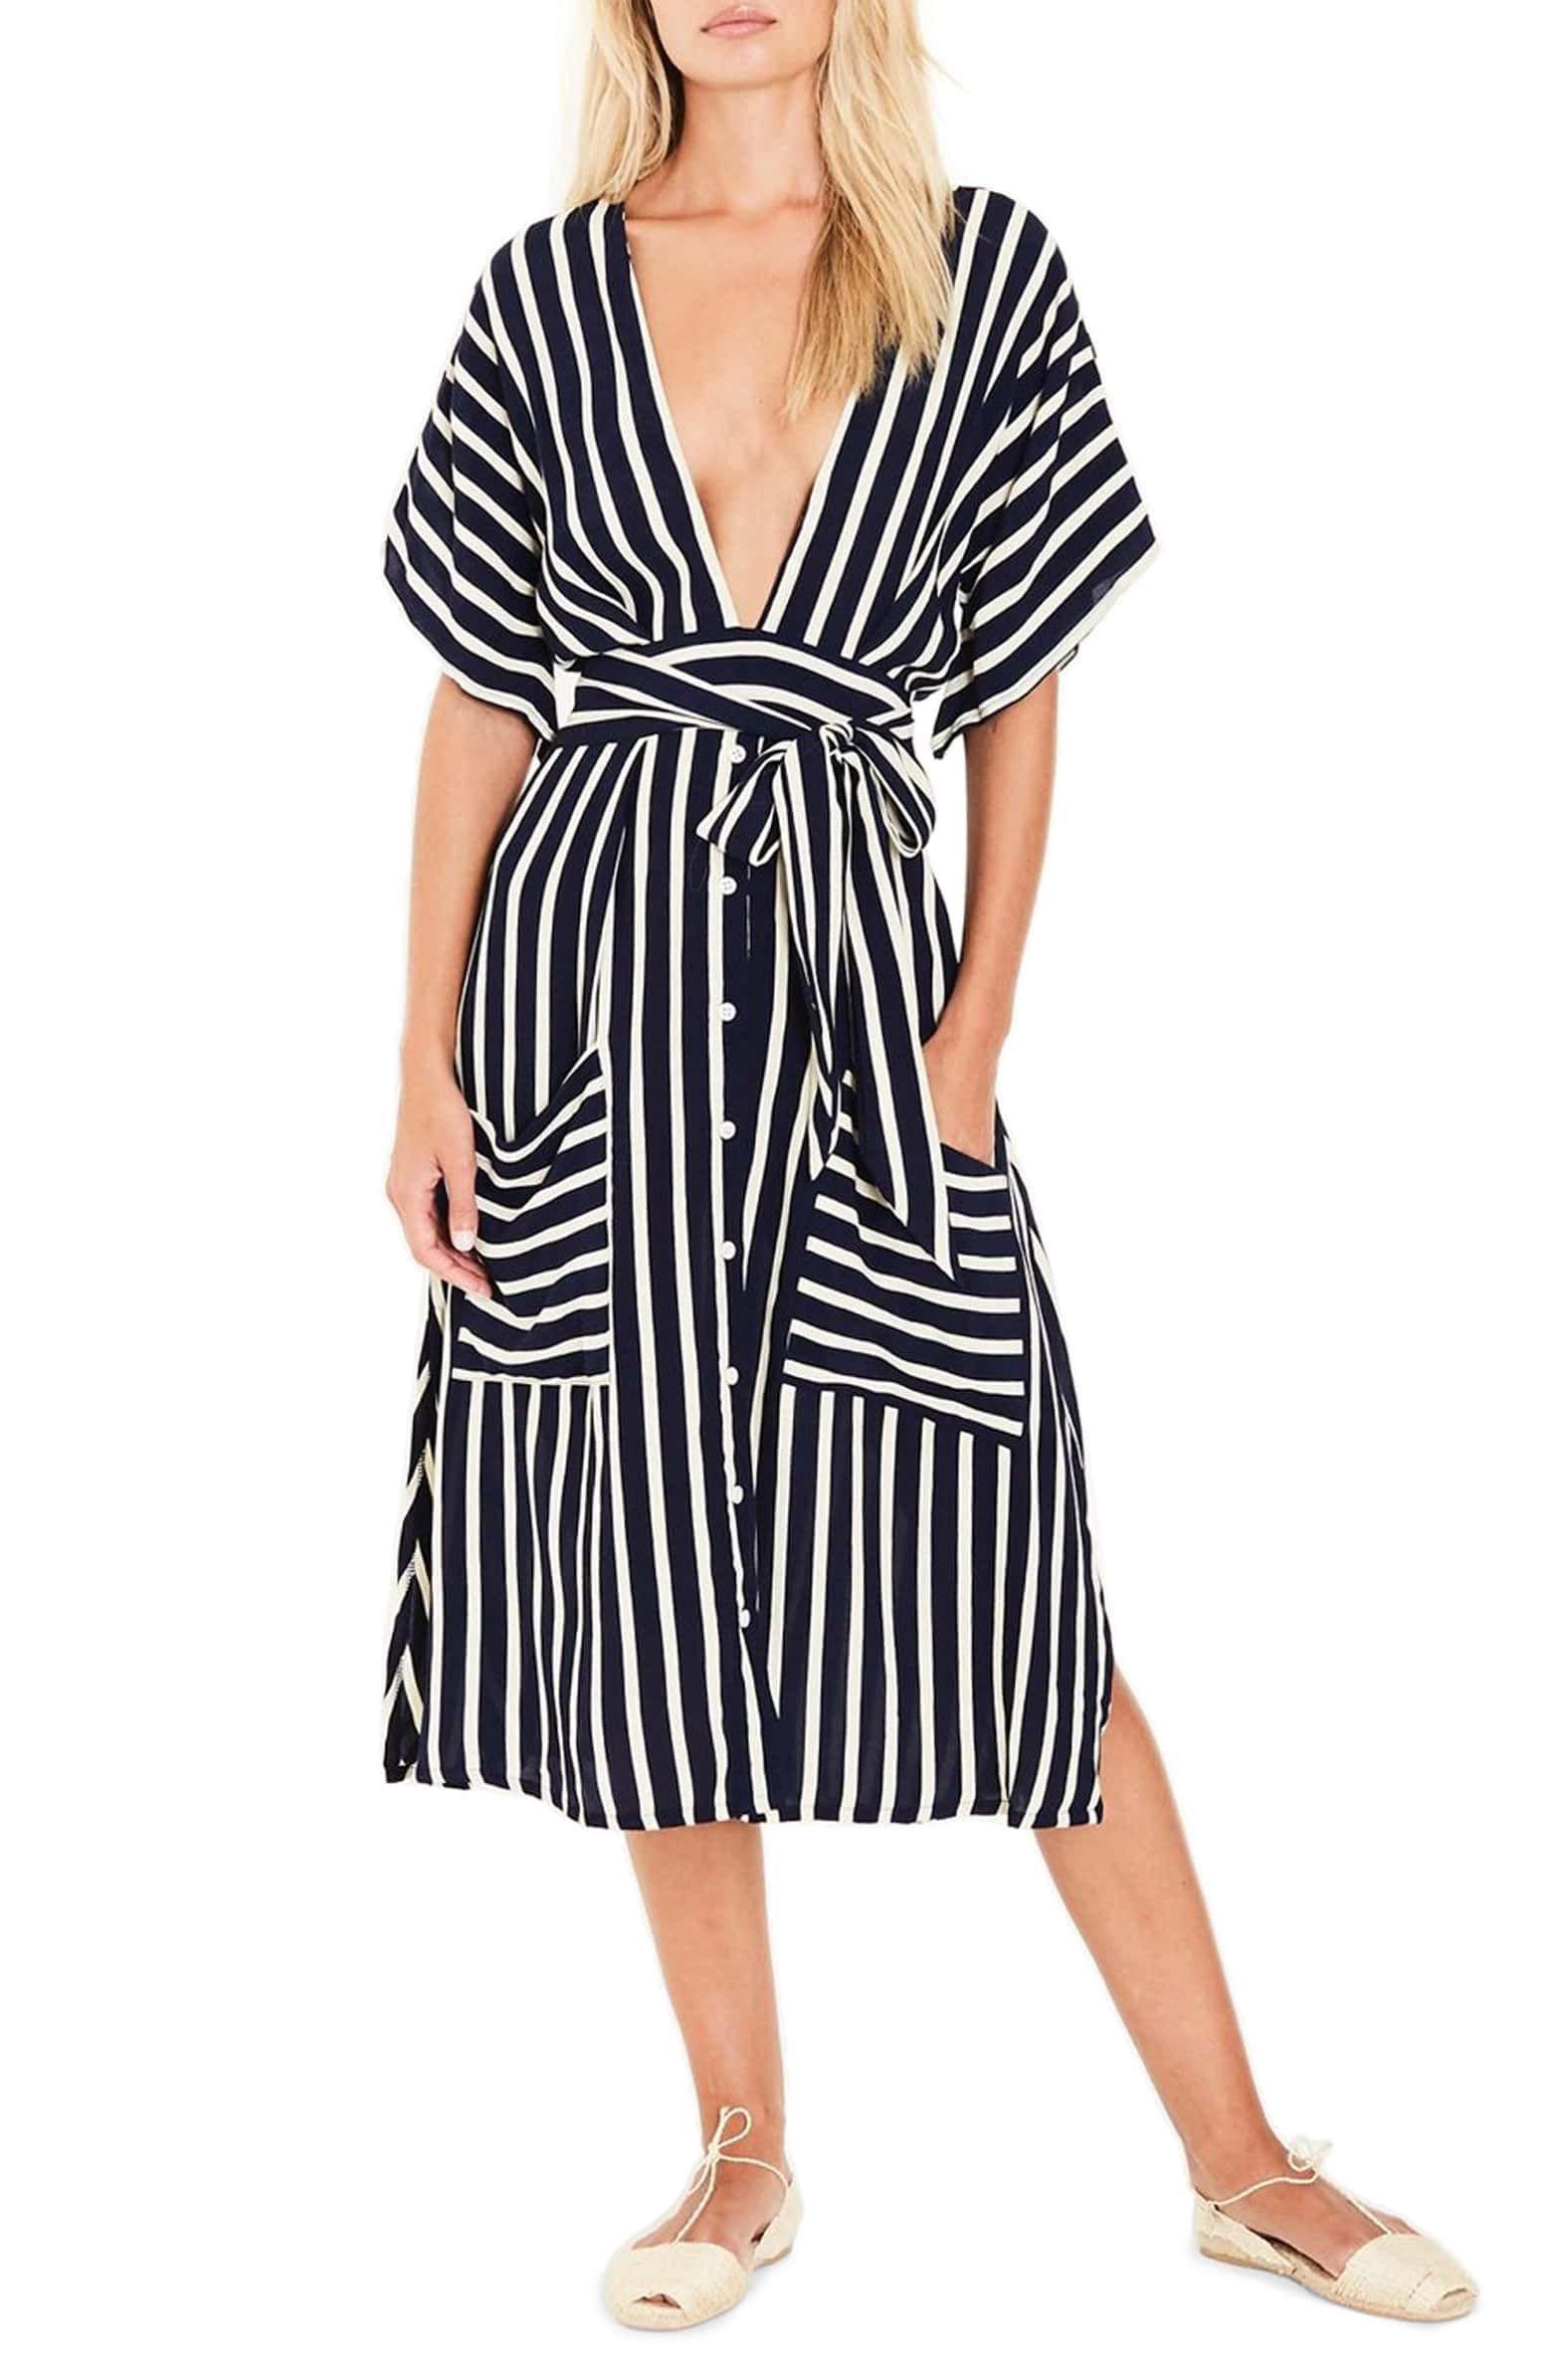 Faithfull The Brand Milan Stripe Midi Dress Nordstrom Striped Midi Dress Midi Dress Style Nordstrom Dresses [ 2392 x 1560 Pixel ]